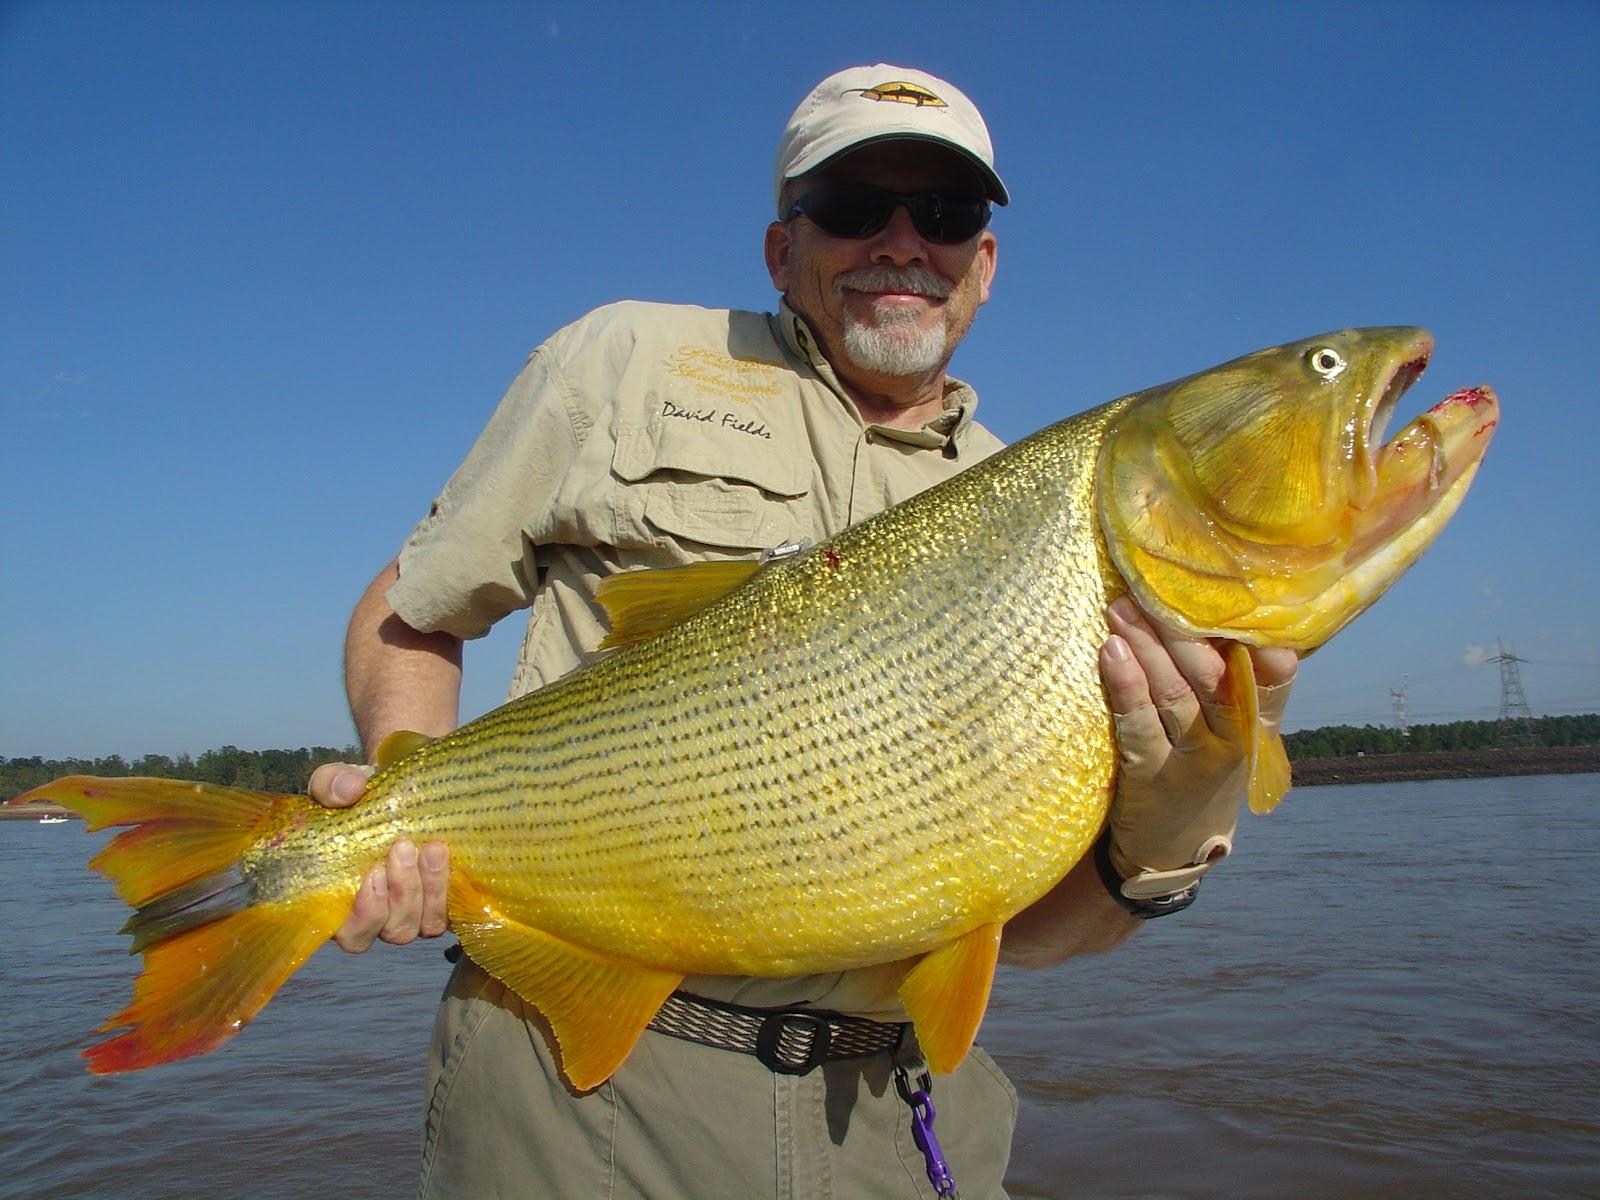 Golden dorado of salto grande uruguay river fishing the for Golden dorado fish